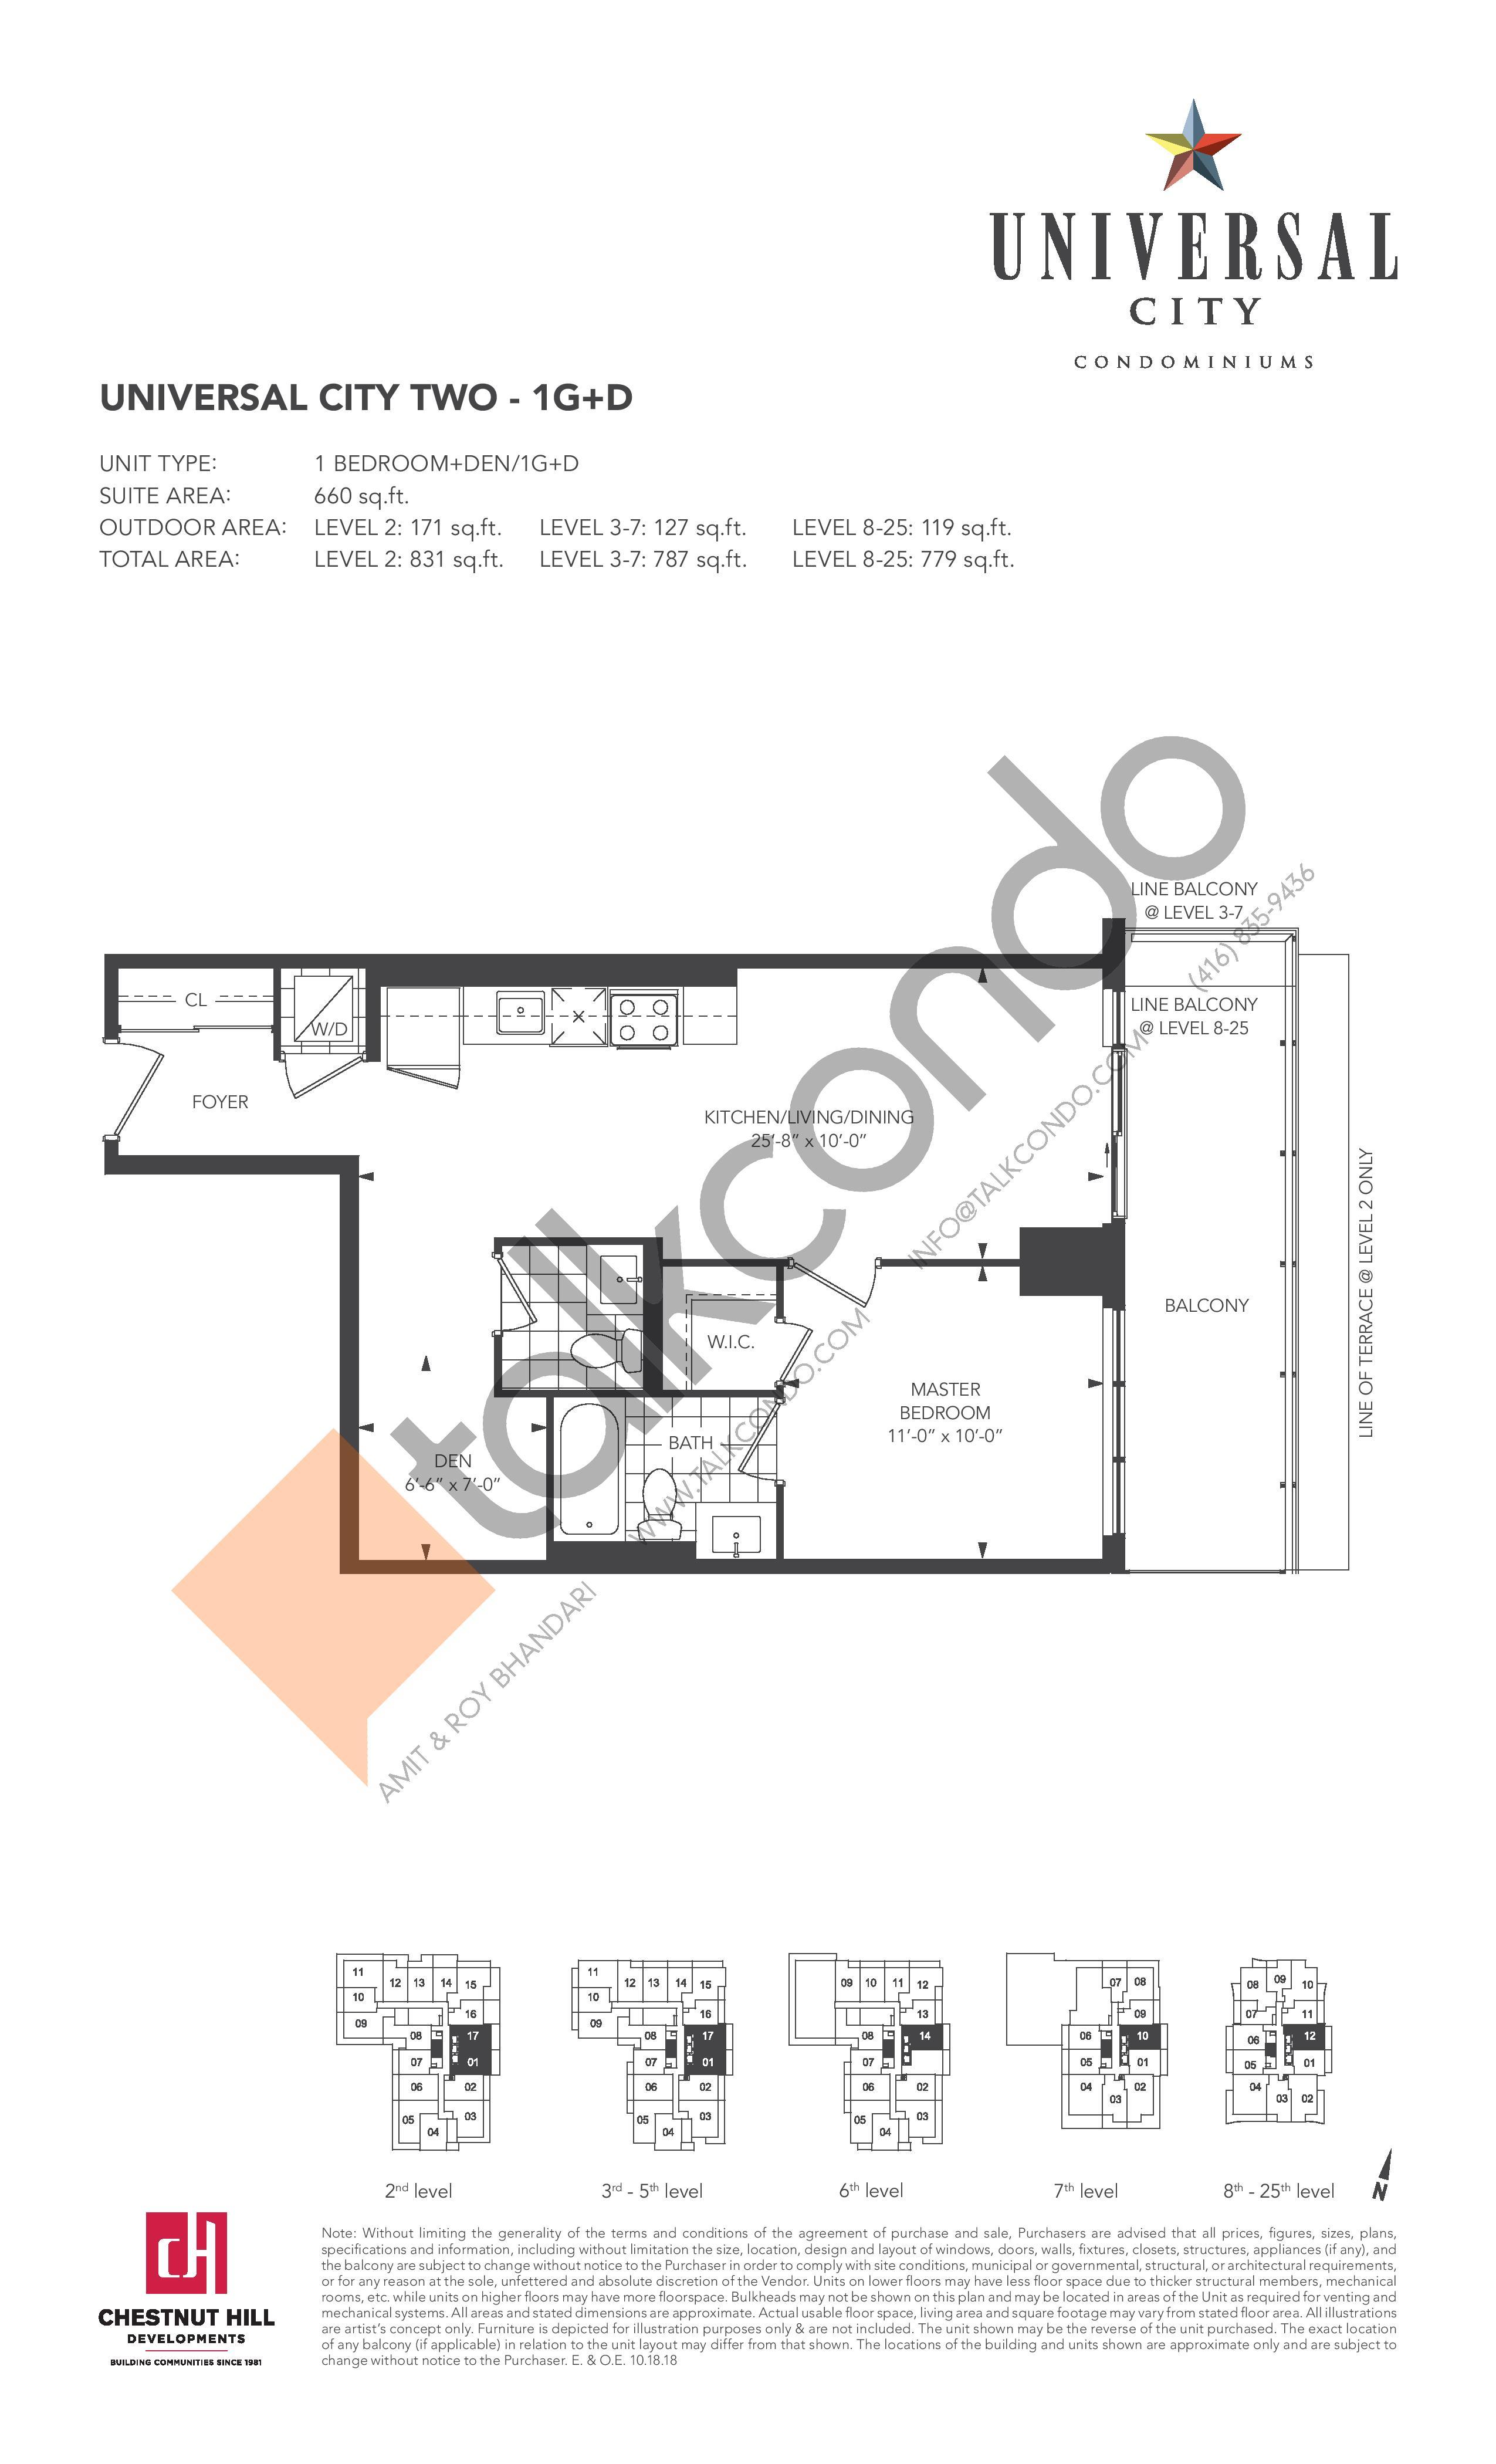 1G+D Floor Plan at Universal City 2 Condos - 660 sq.ft